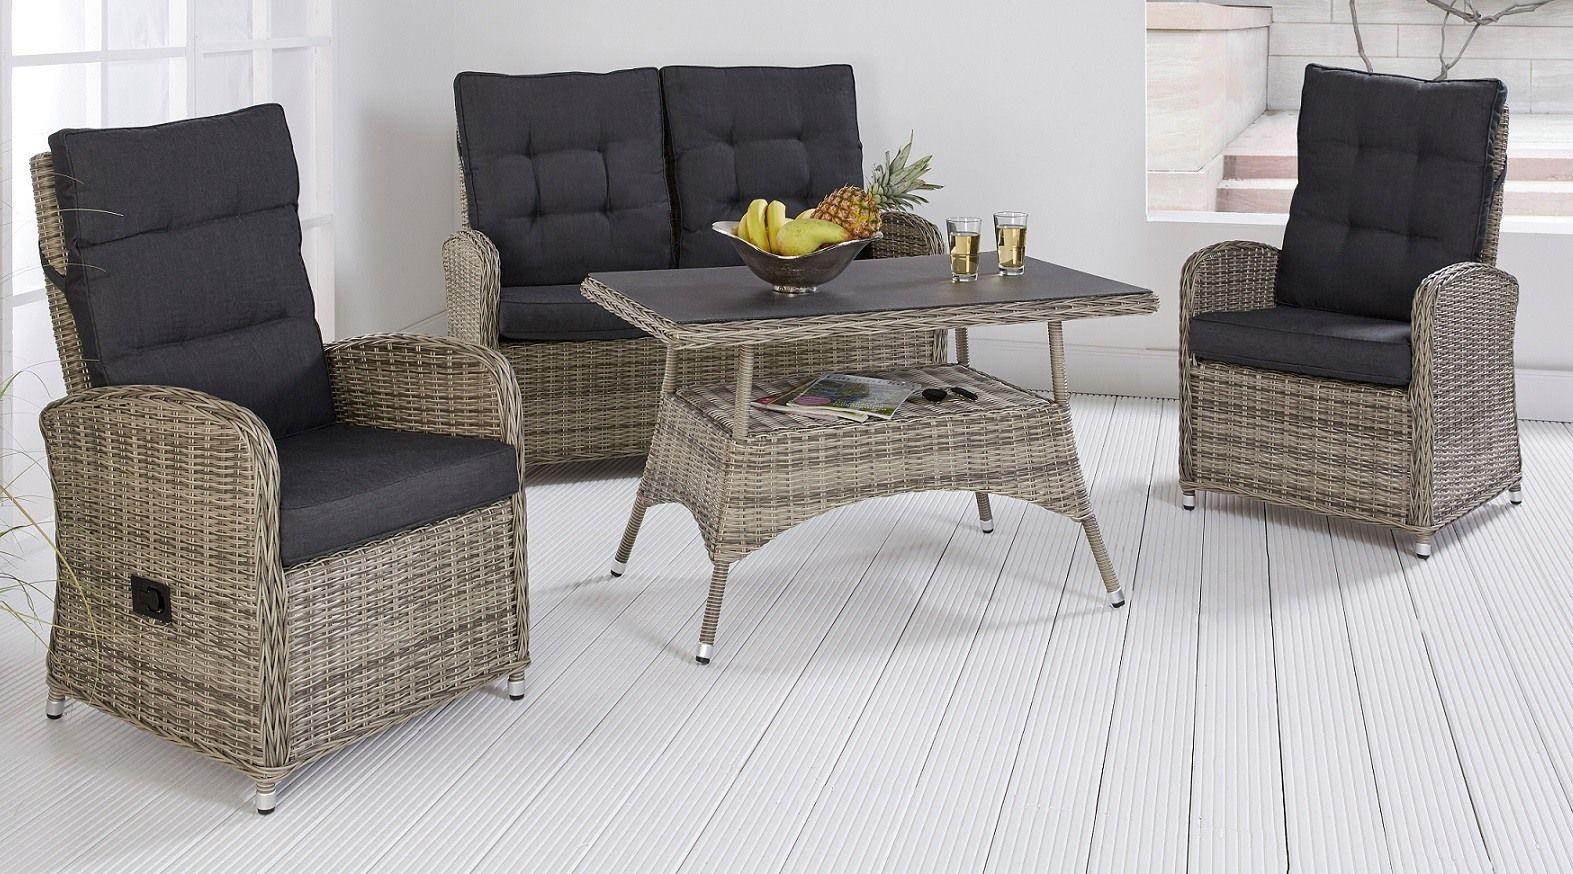 Lounge Gartenmobel Set Antigua Grau 12teilig Gartenmobel Set Loungemobel Polyrattan